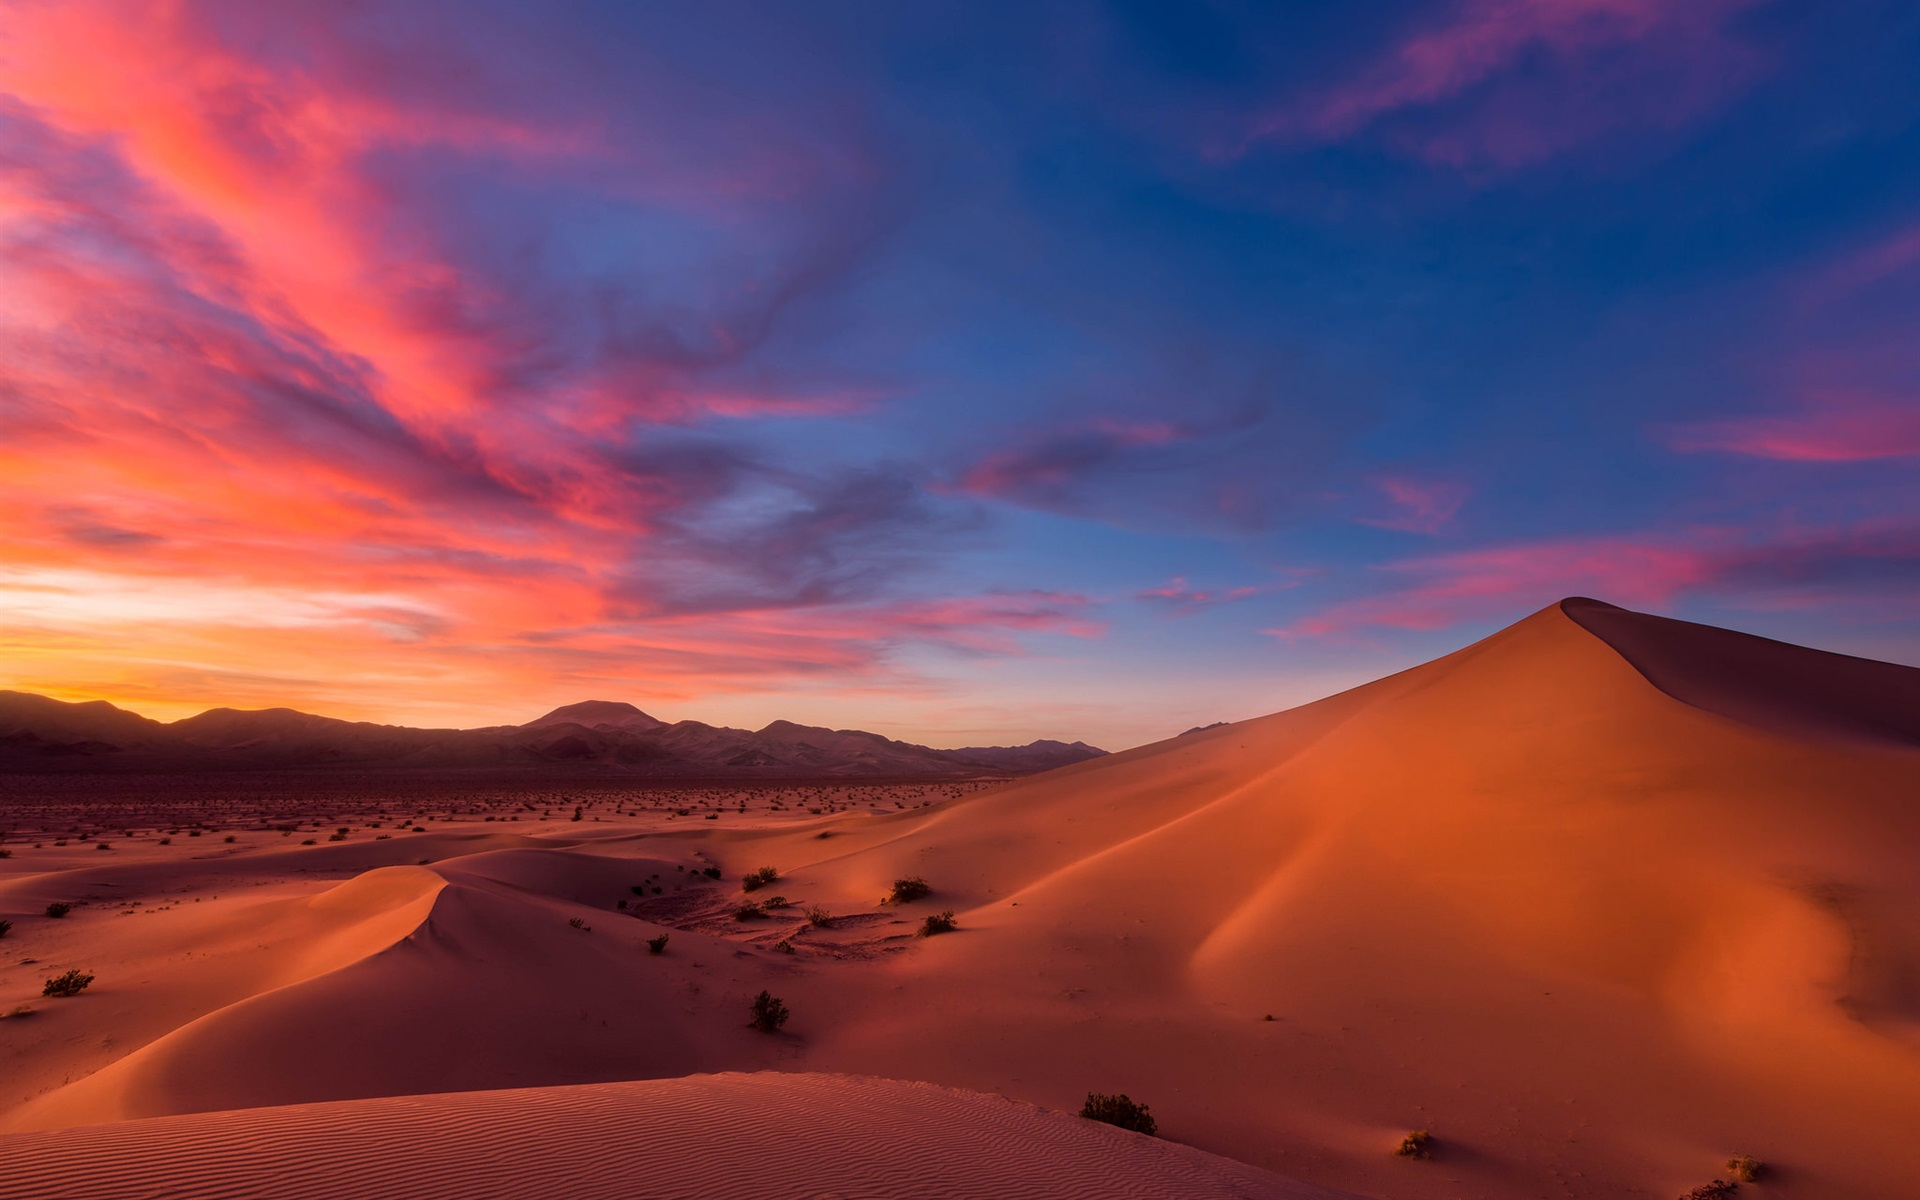 картинки небо пустыни таких